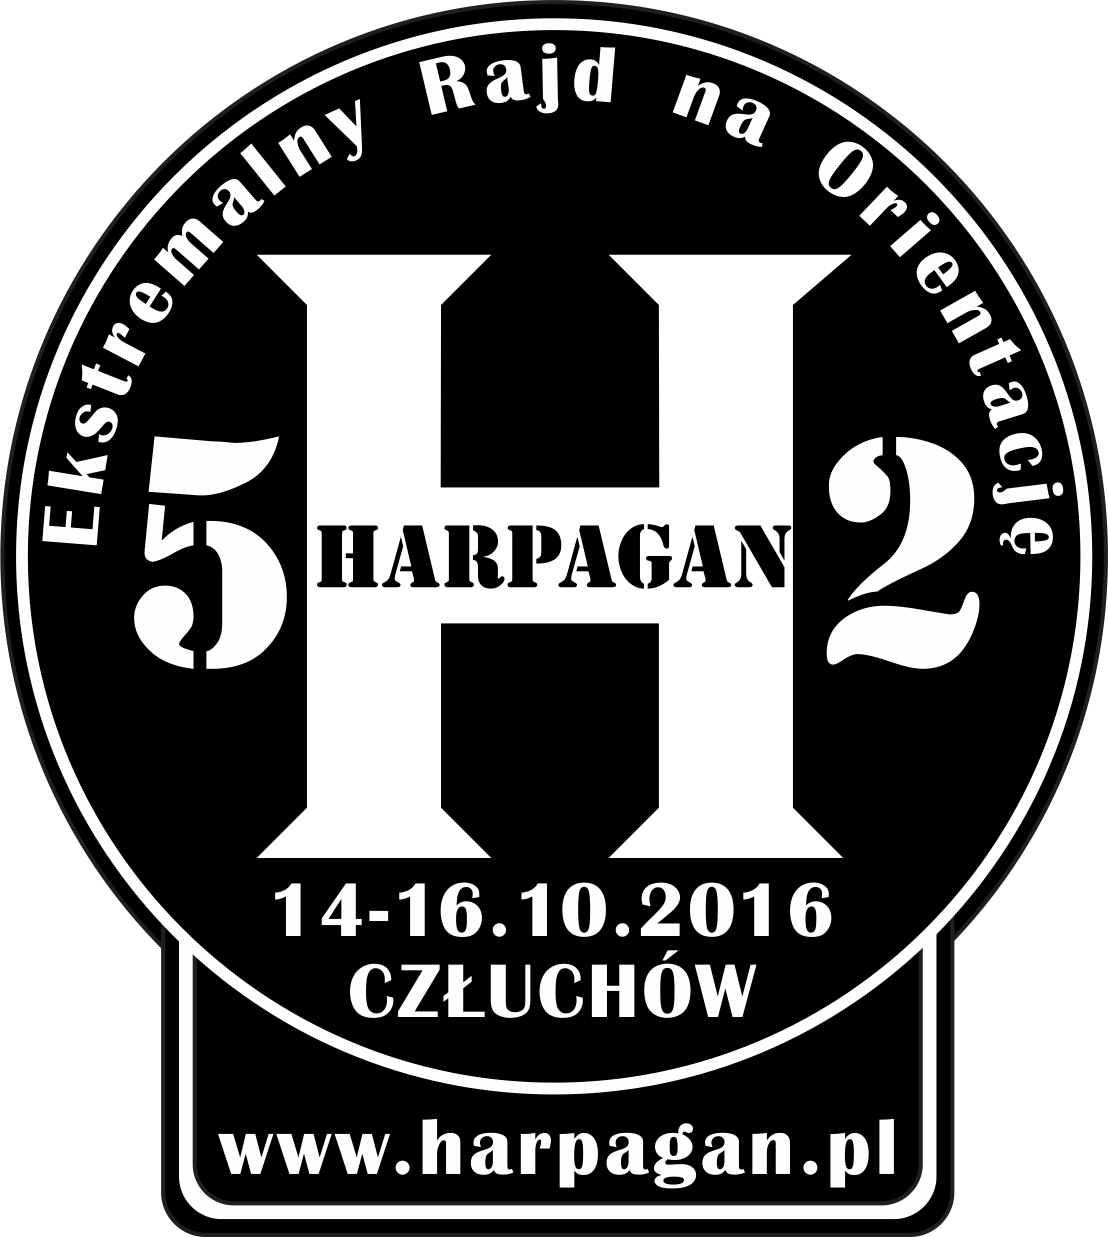 Ruszamy z Harpaganem-52!